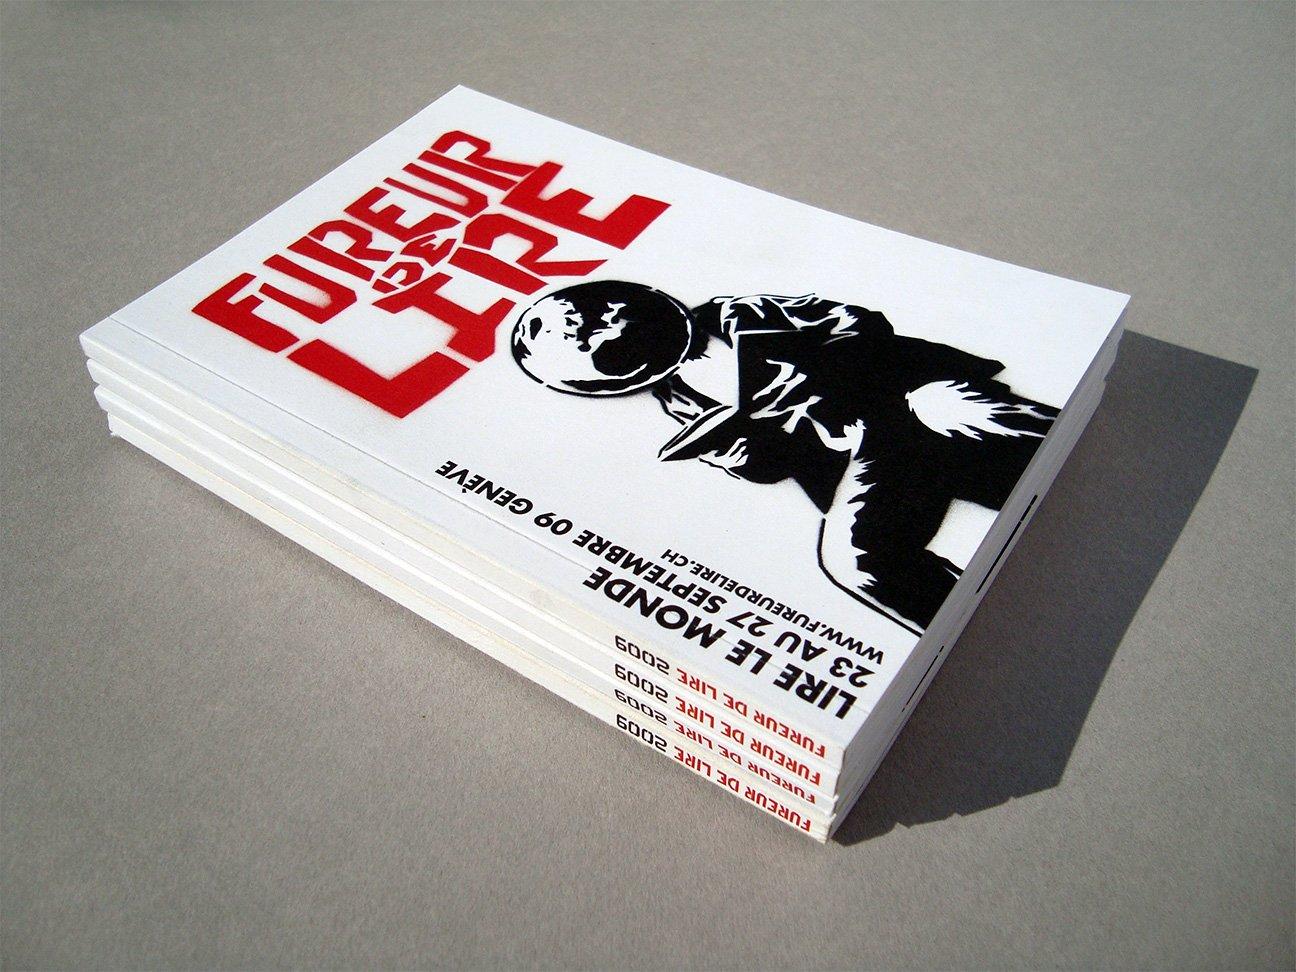 fabien_cuffel_book_festival_litteraire_fureur_lire_2009_ok